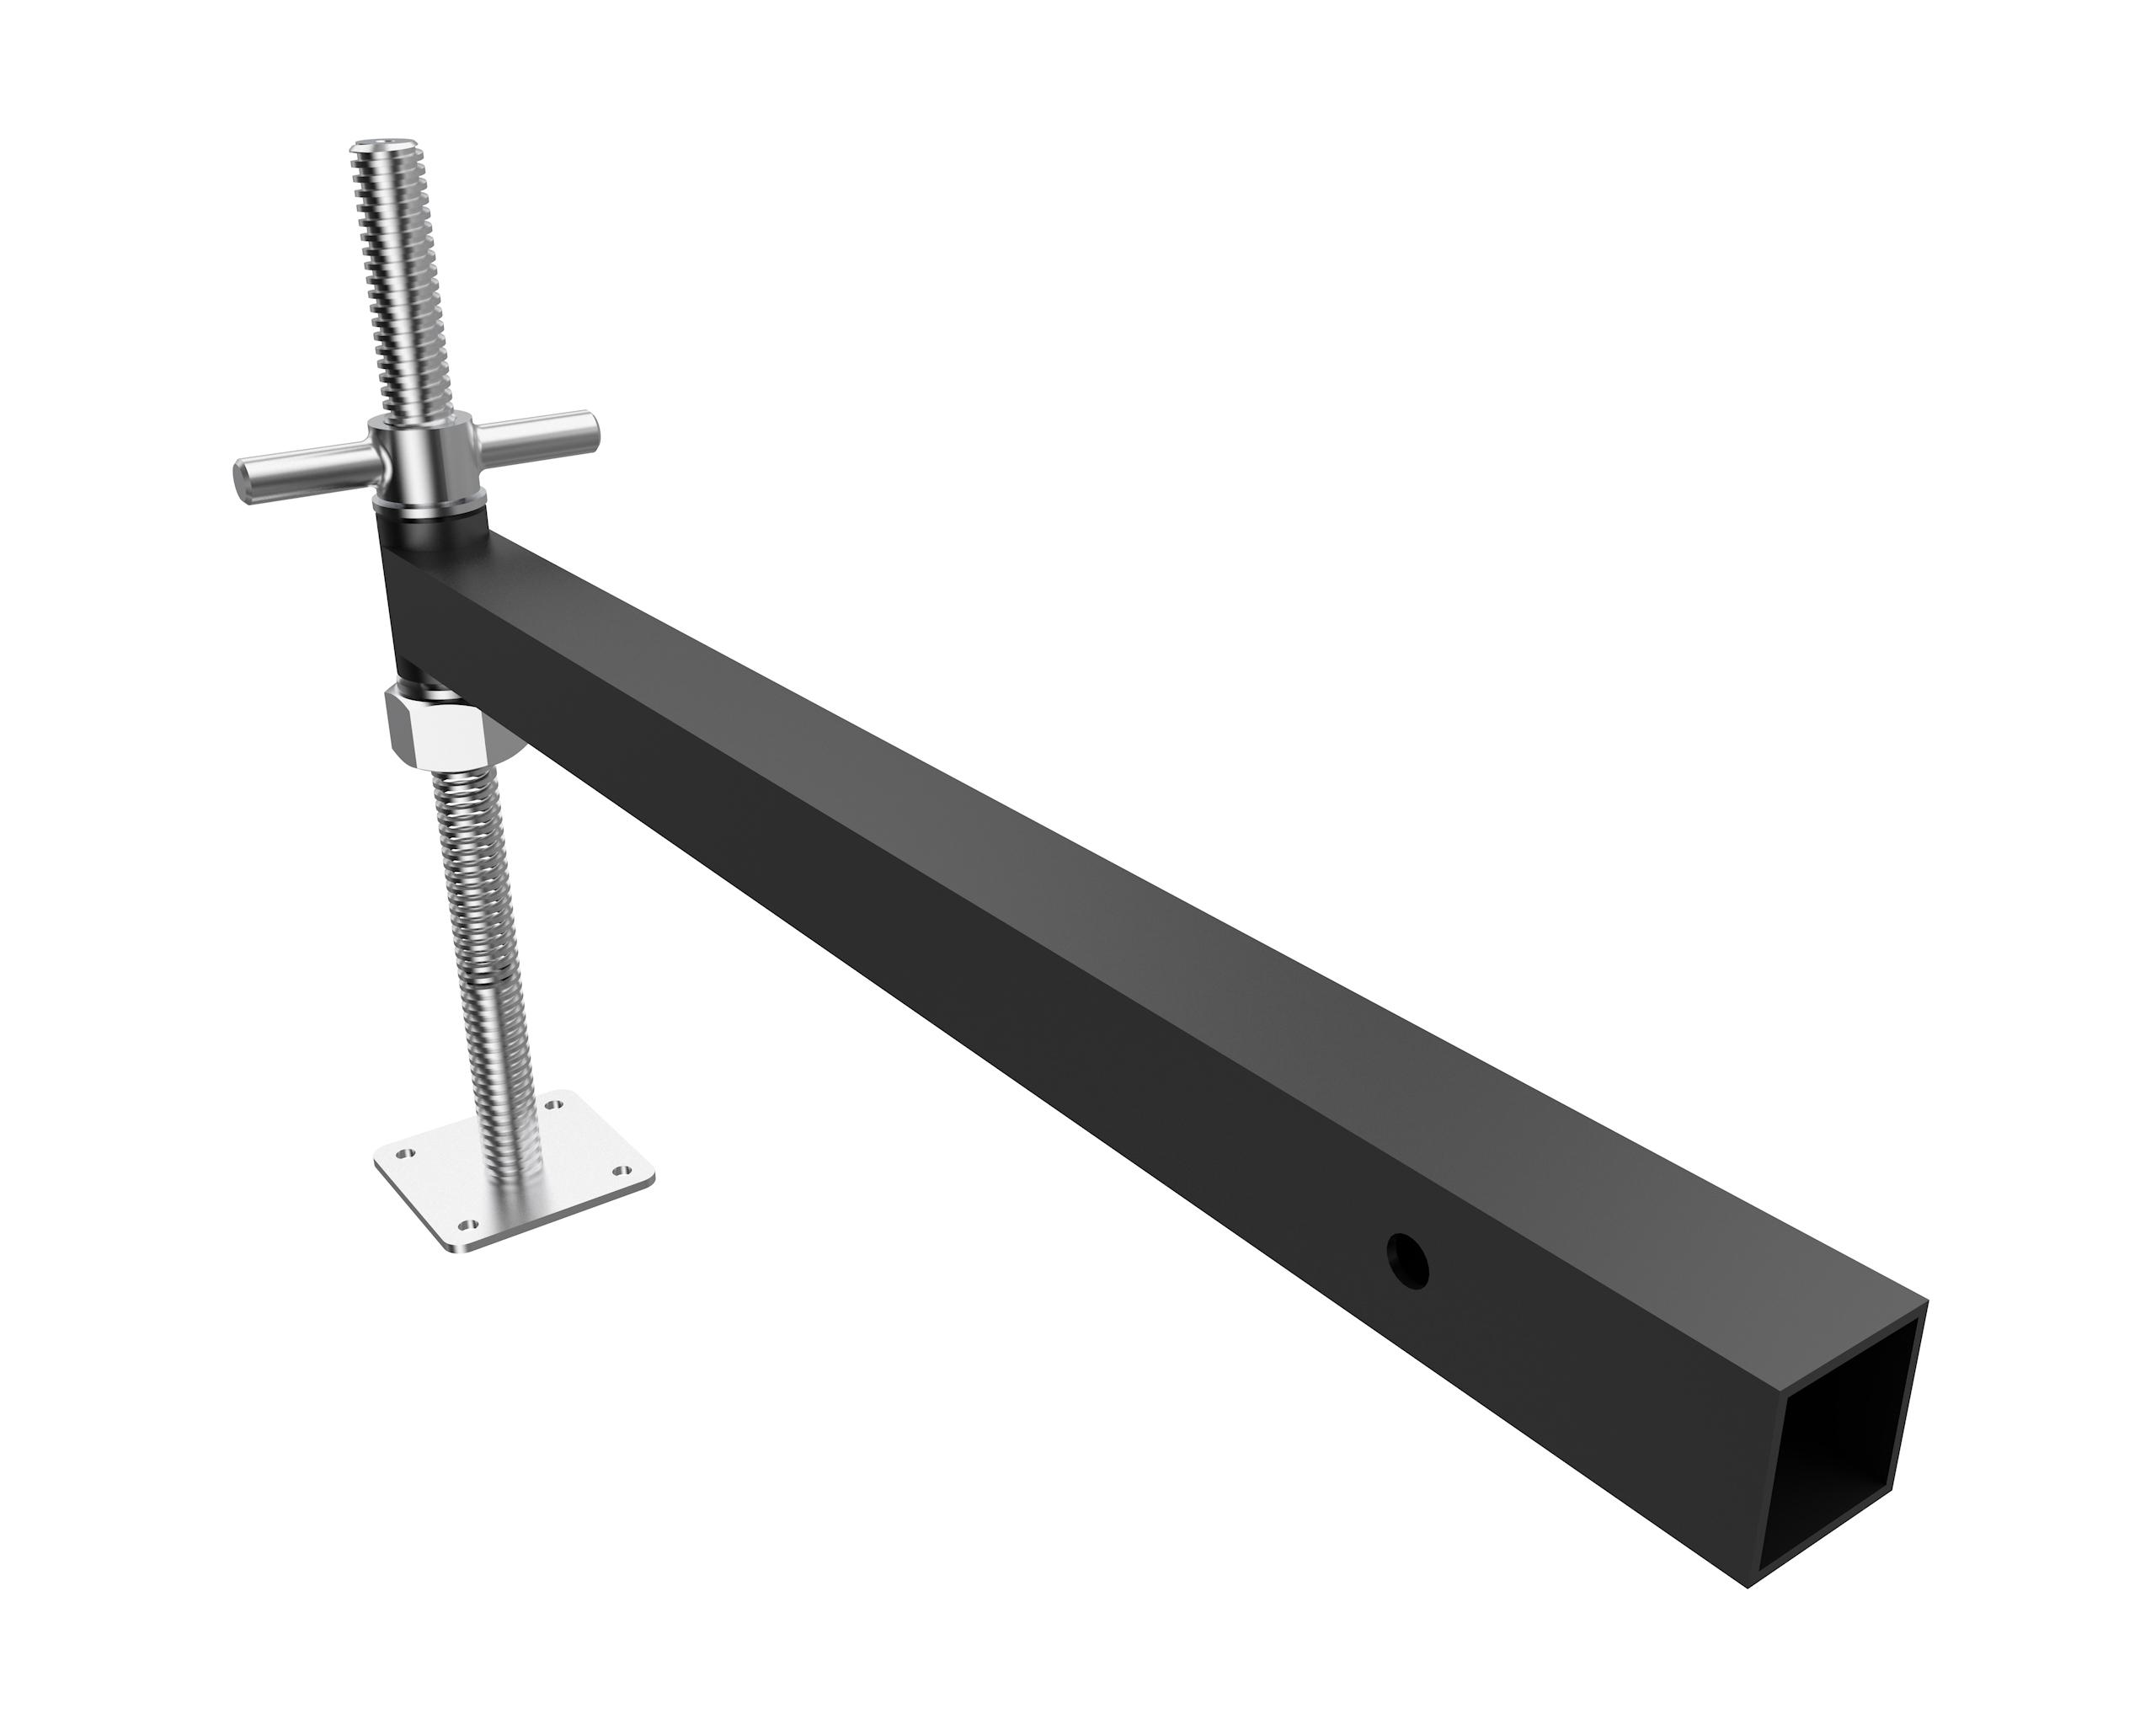 Outrigger für Bodenplatte 75cm Stahl